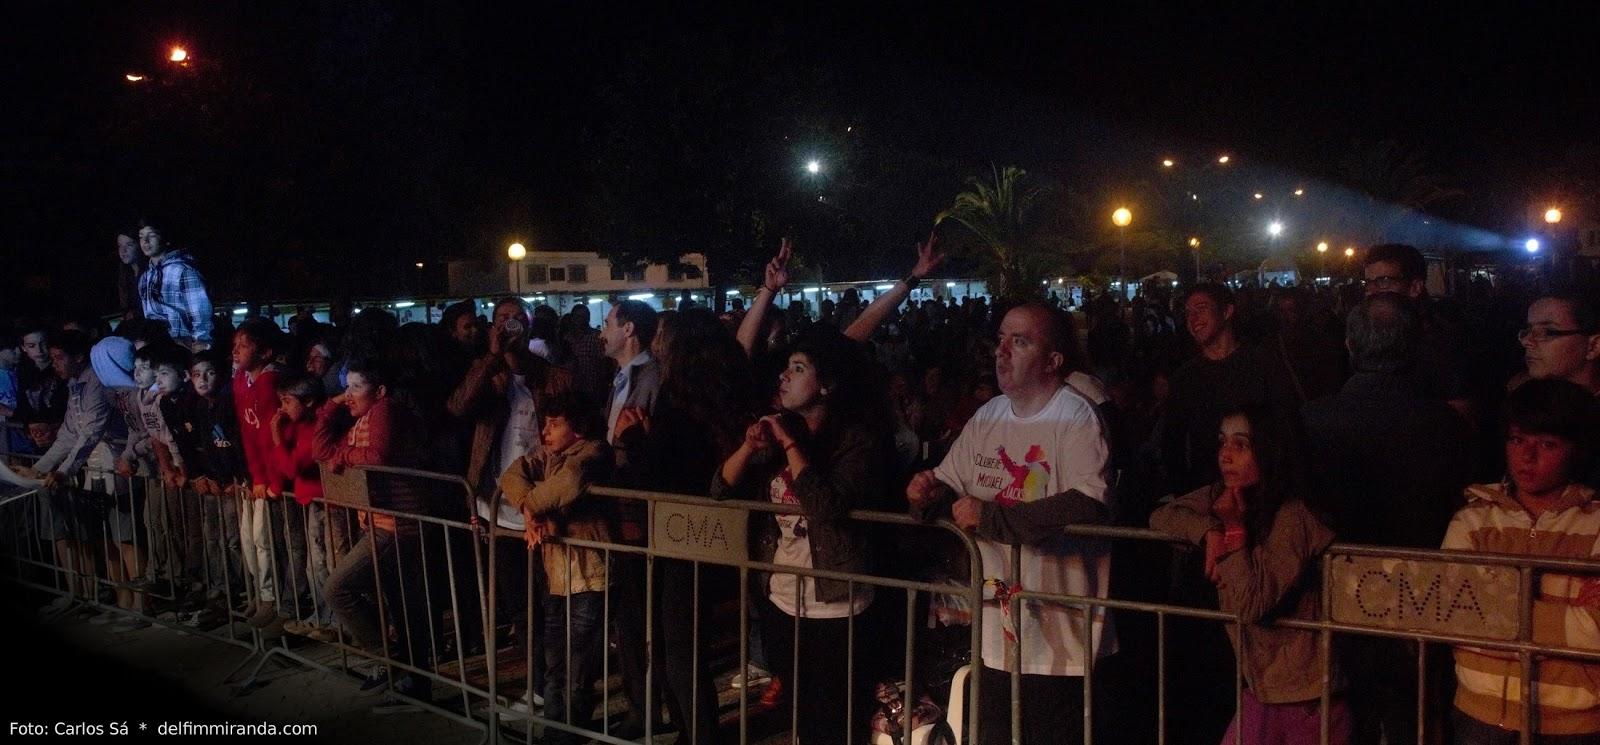 Delfim Miranda - Michael Jackson Tribute - Audience in a Show